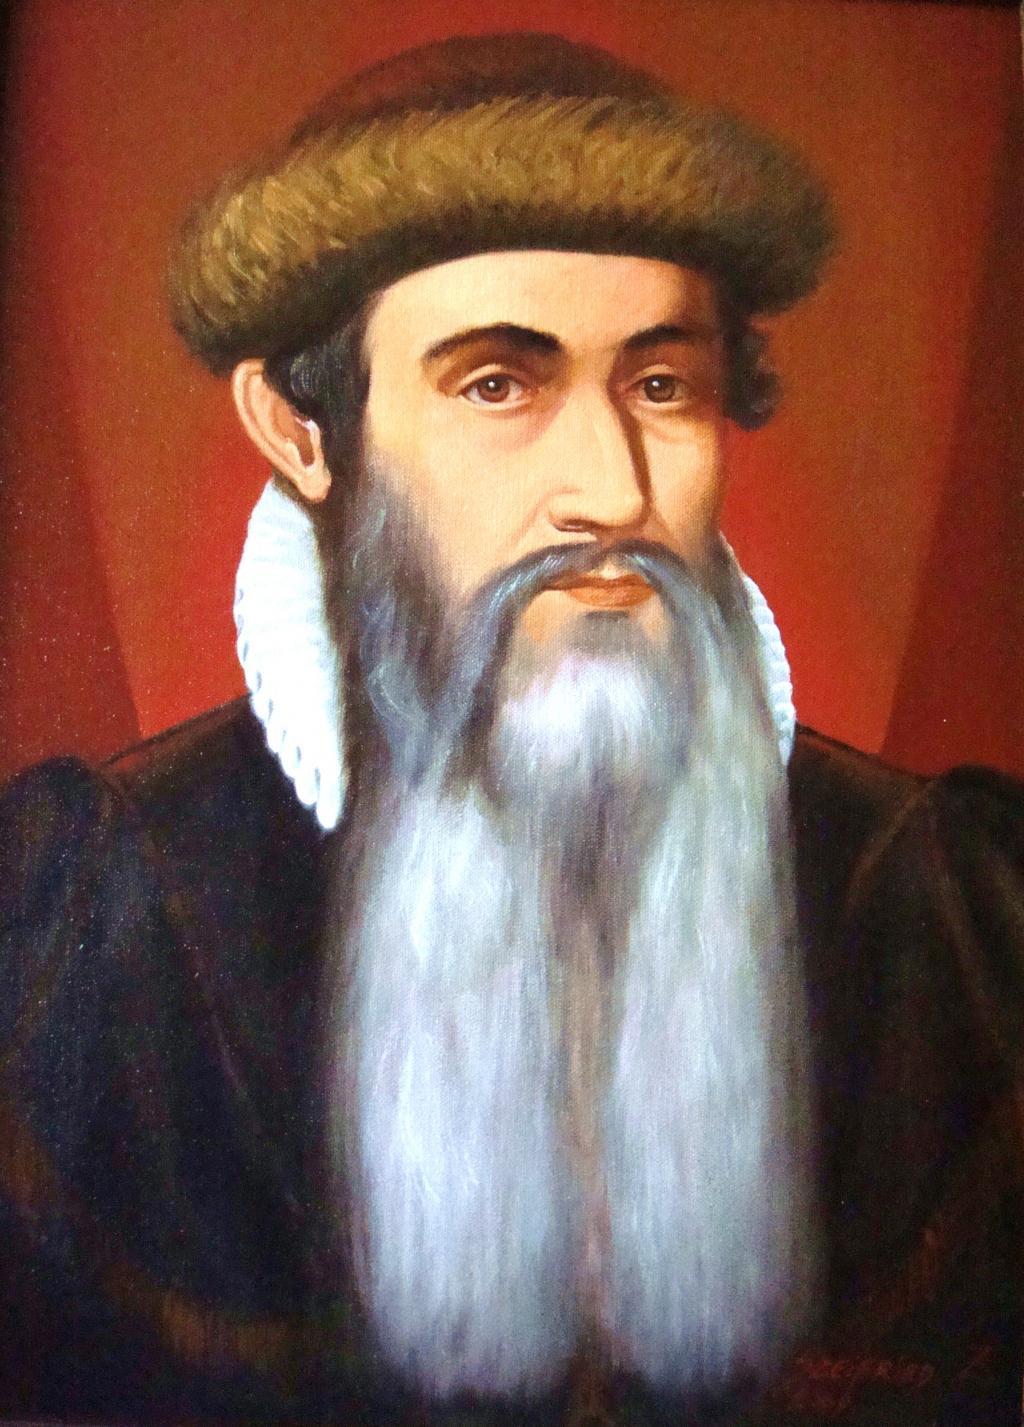 Johannes Gutenberg : โยฮันน์ กูเต็นเบอร์ก (1400-1468 ...